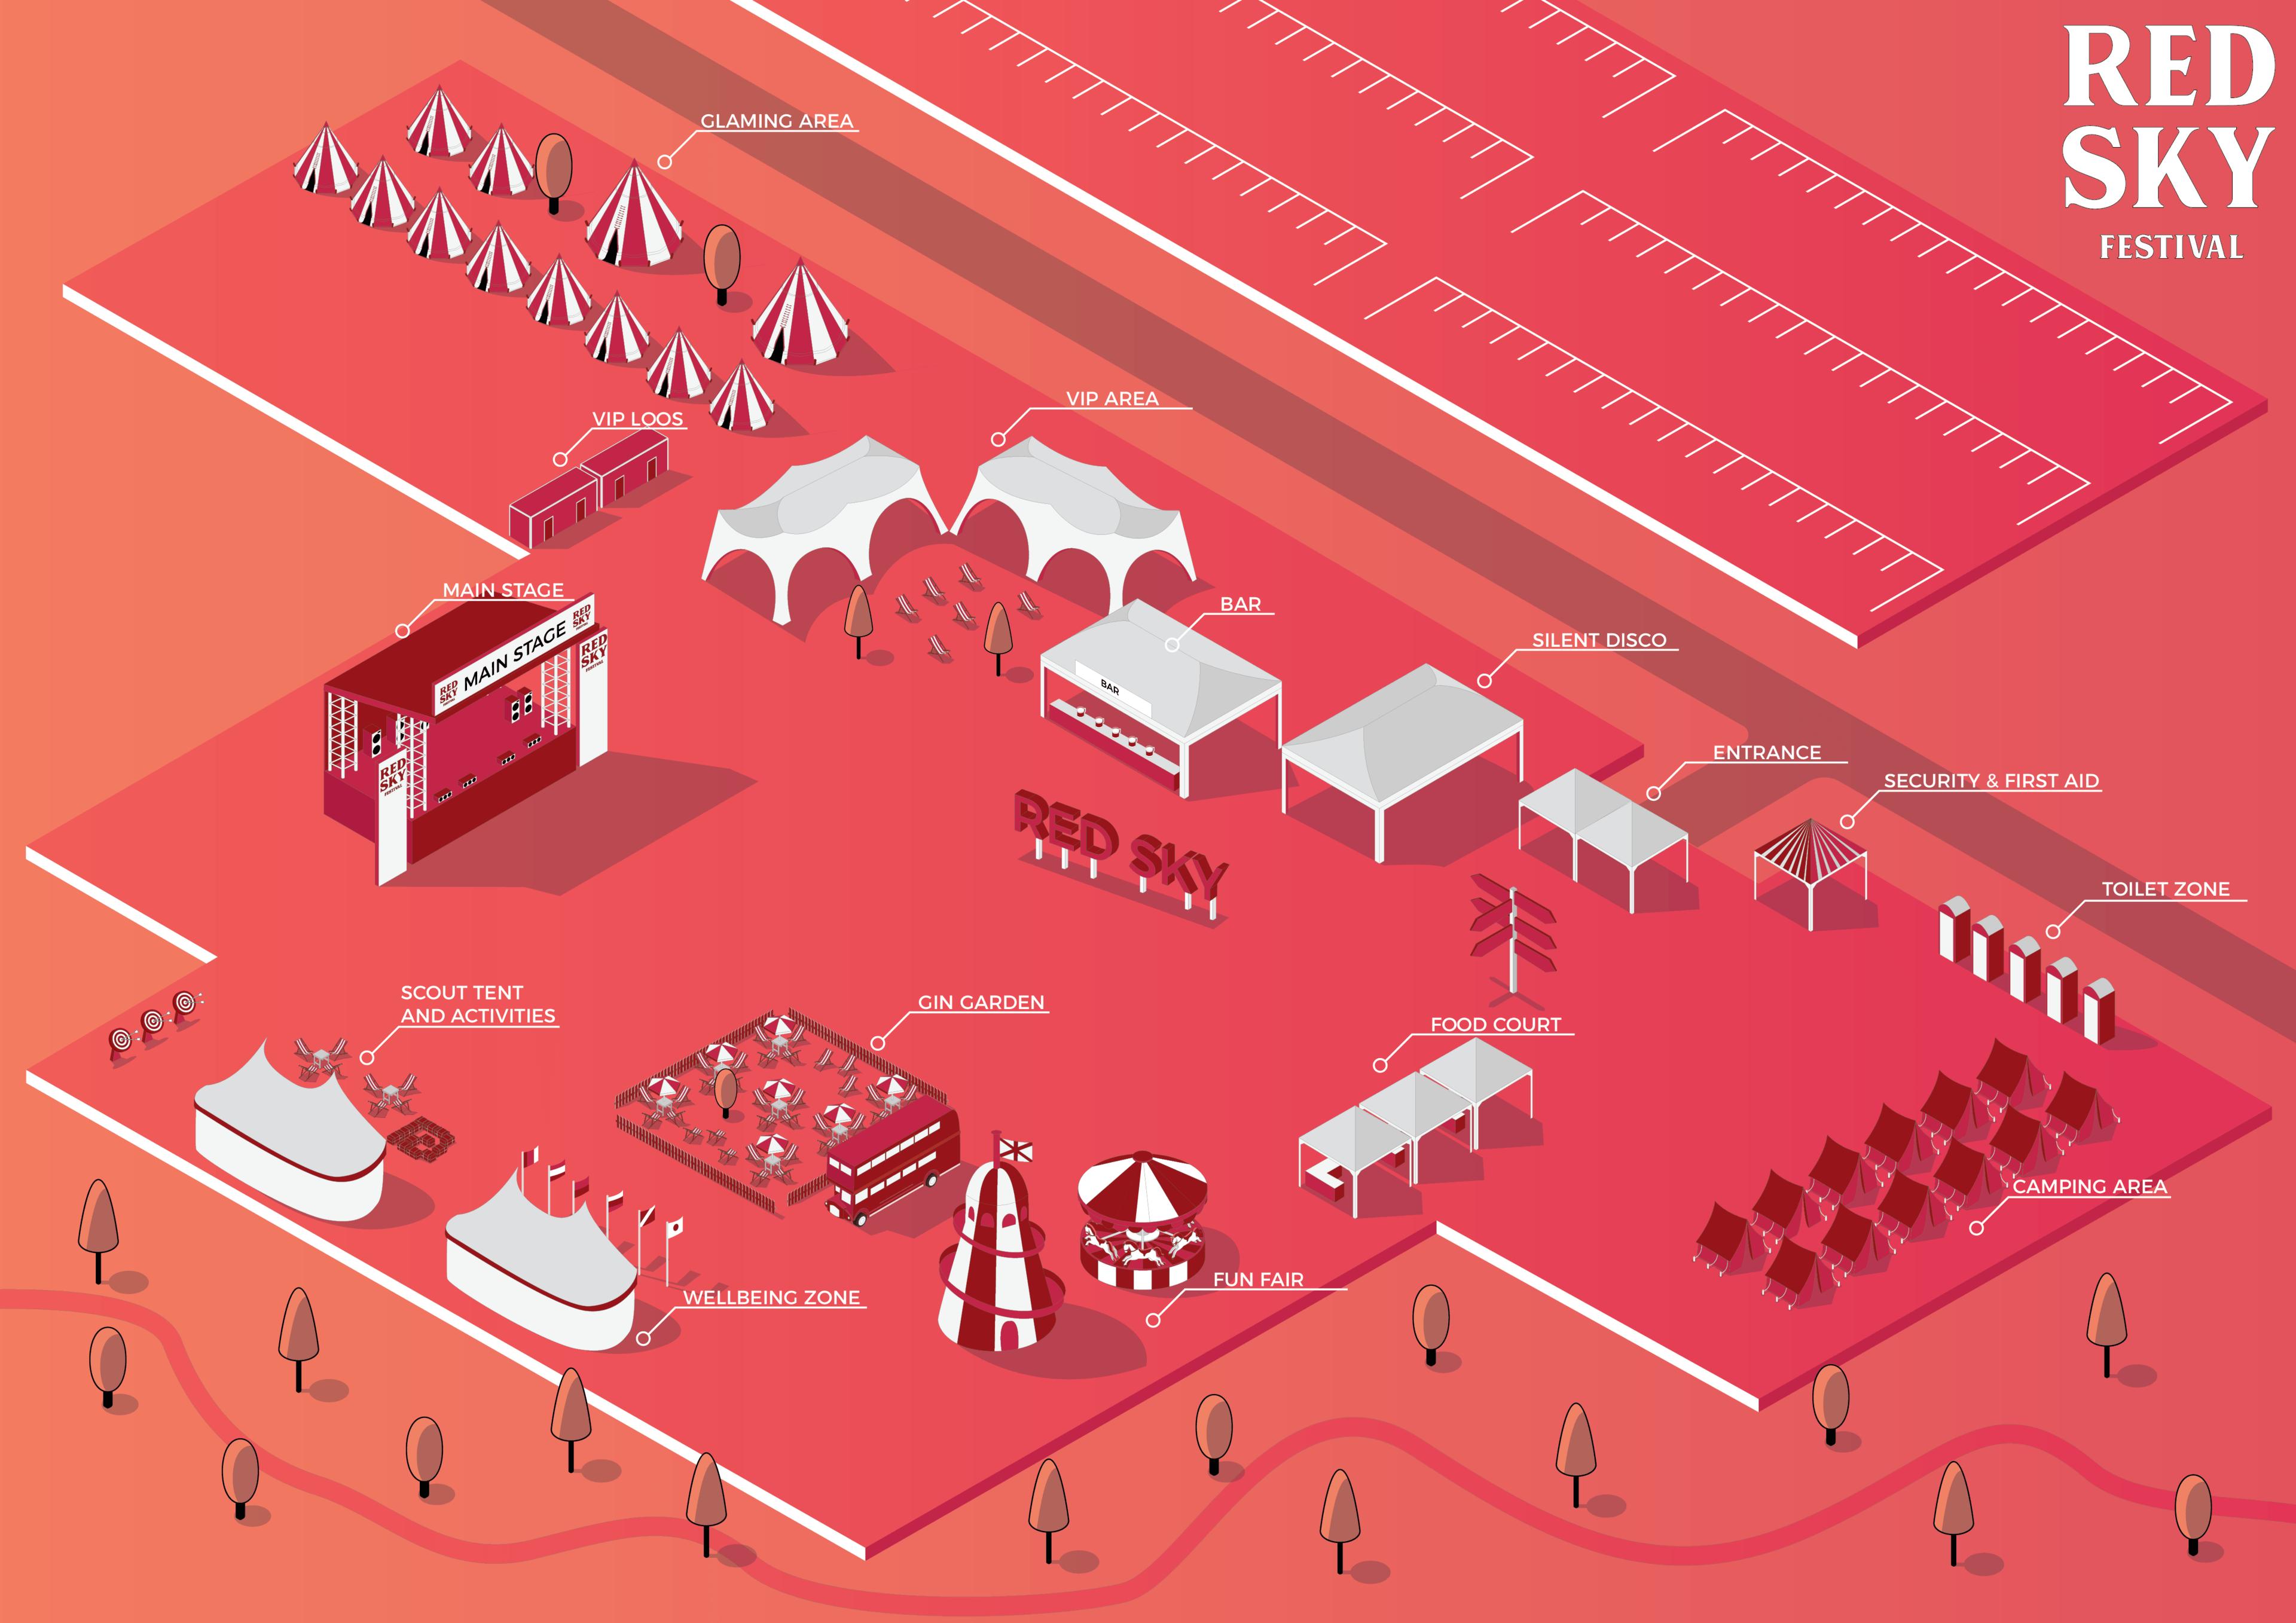 Red Sky Festival Map 2019